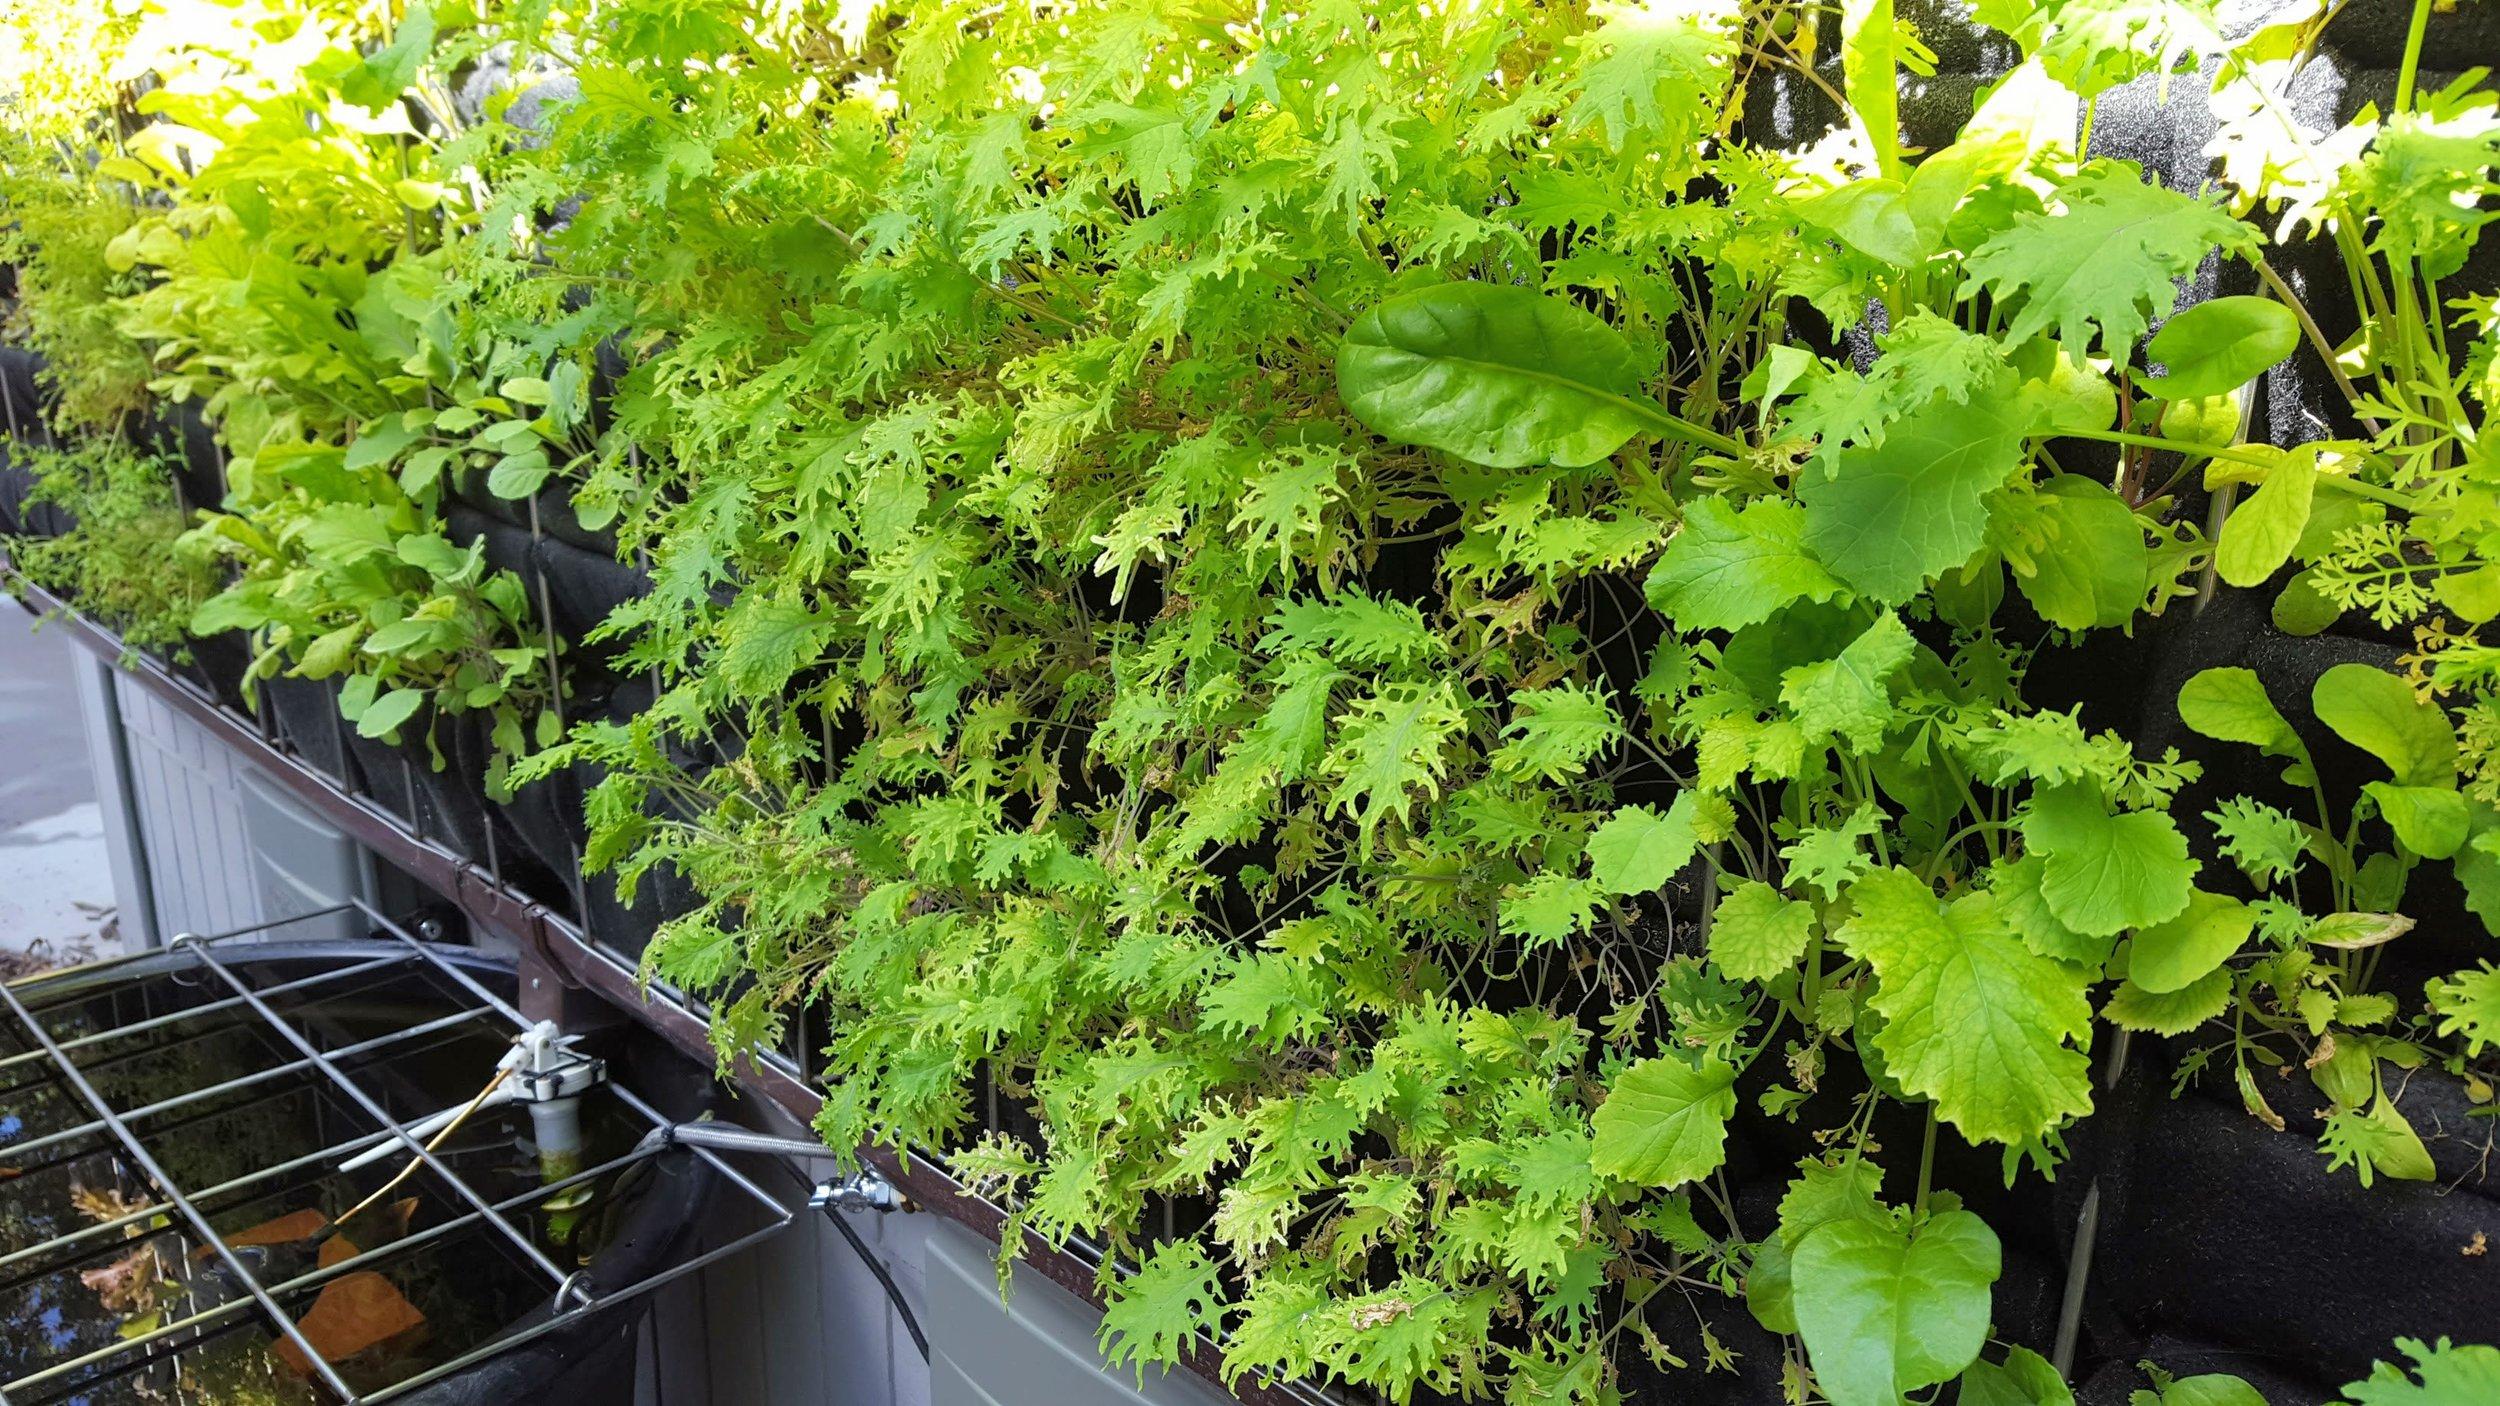 Florafelt Pro System Aquaponics Chris Bribach Sonoma California 17.jpg